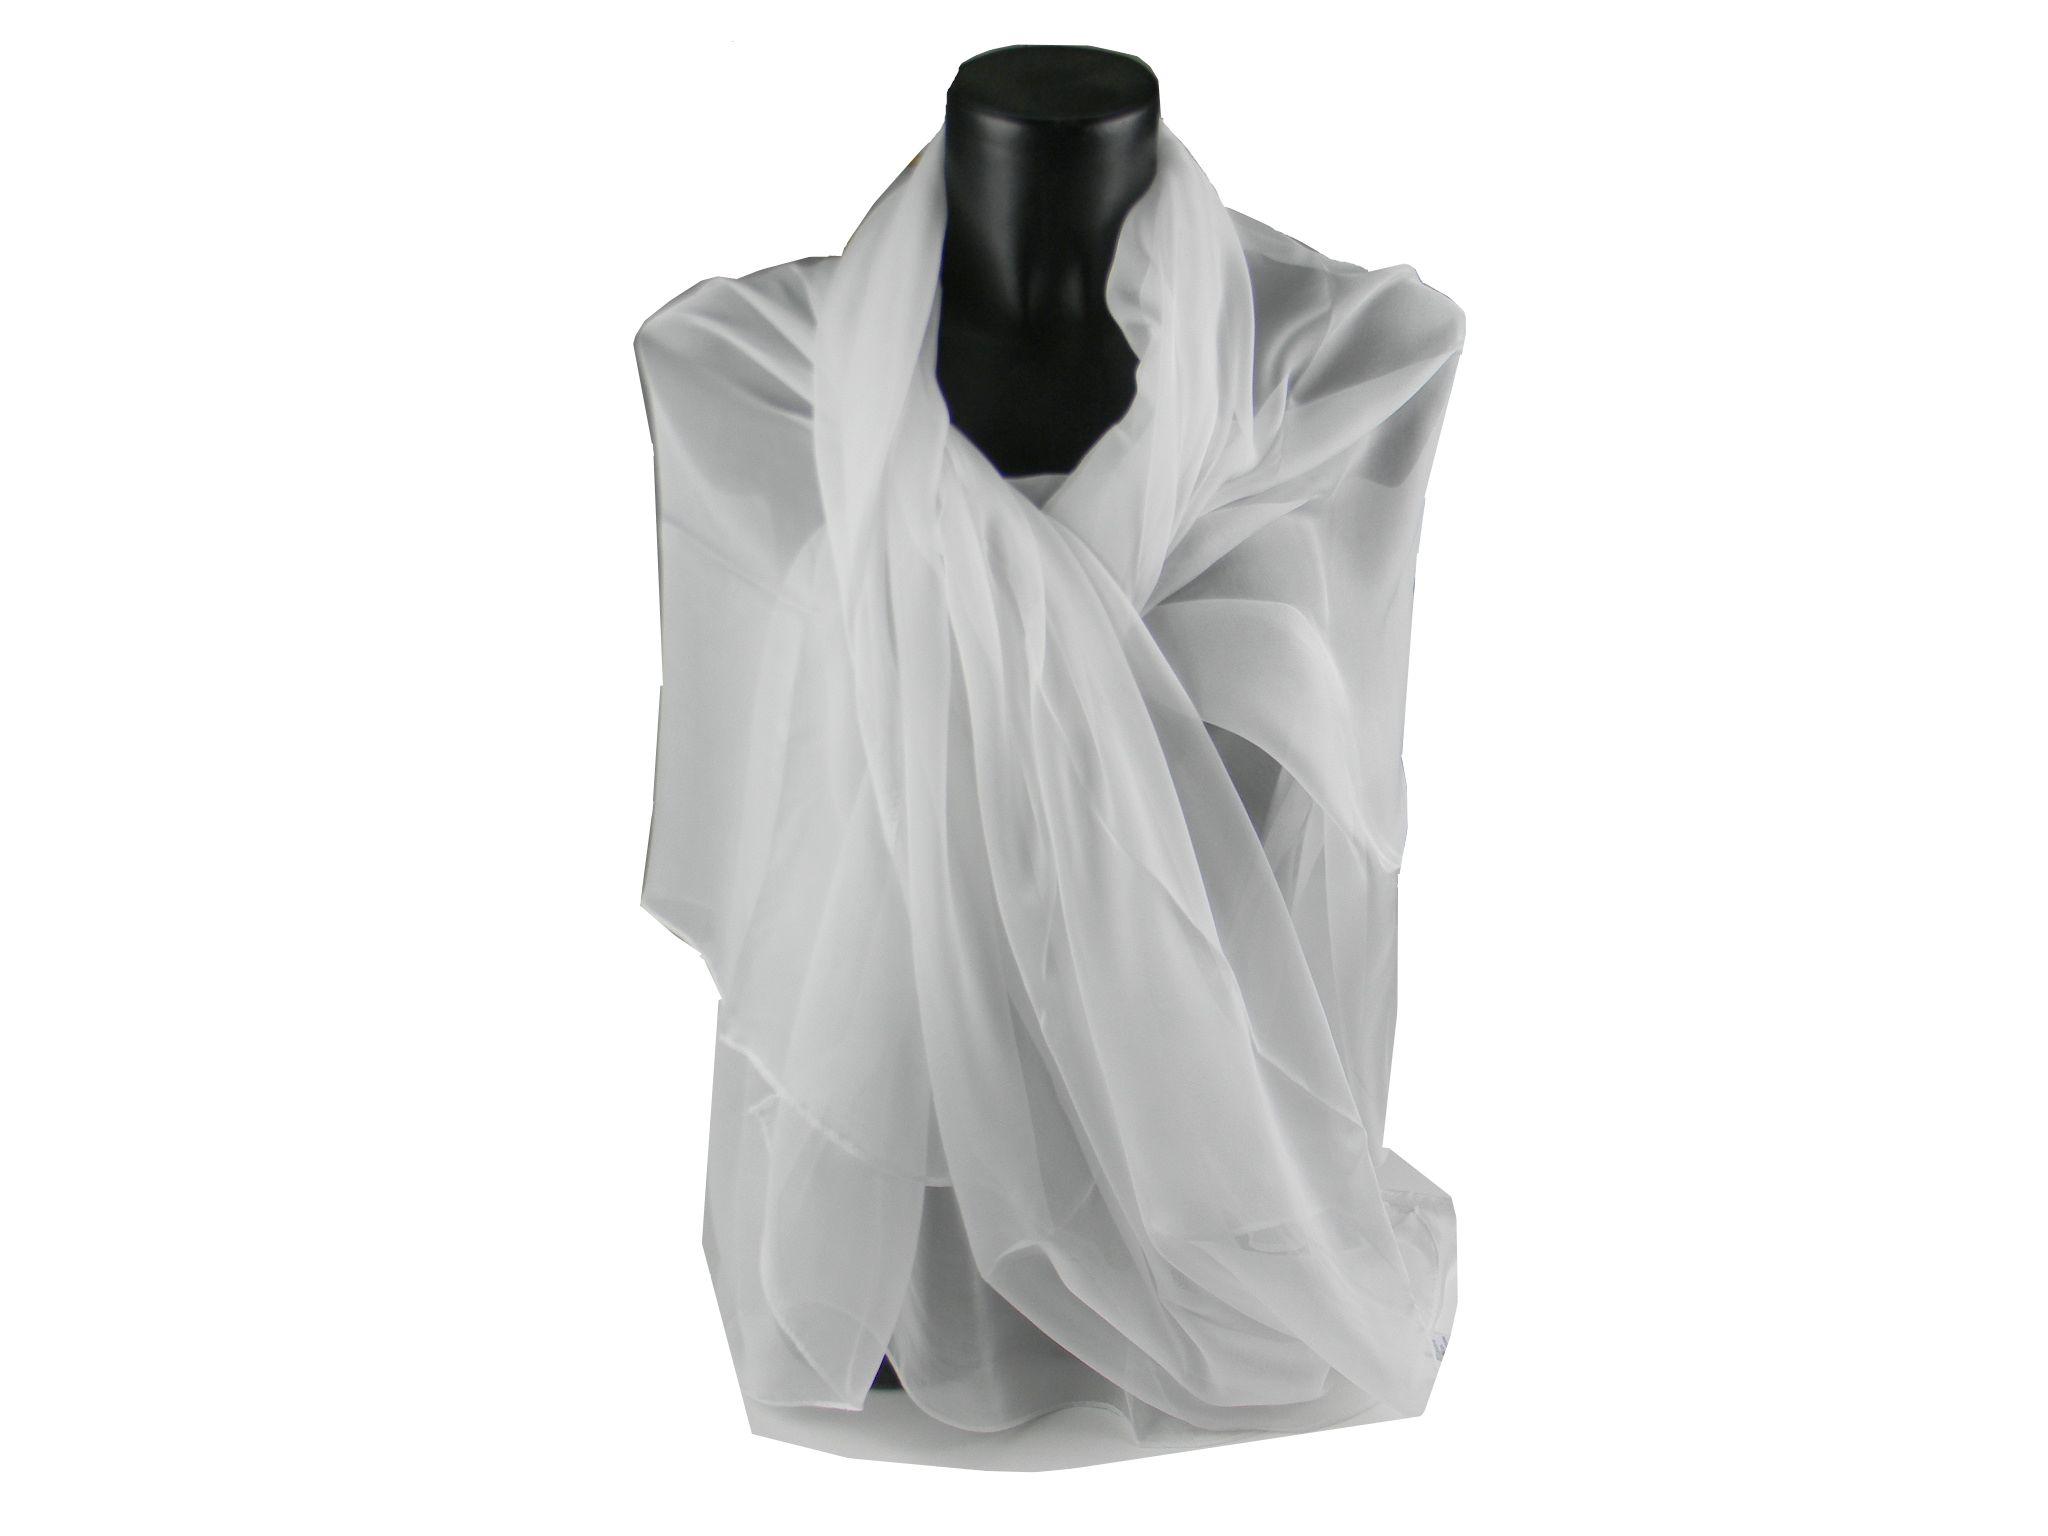 miglior servizio 39062 660e2 Stola elegante liscia raso seta donna cerimonia I AvantGarde